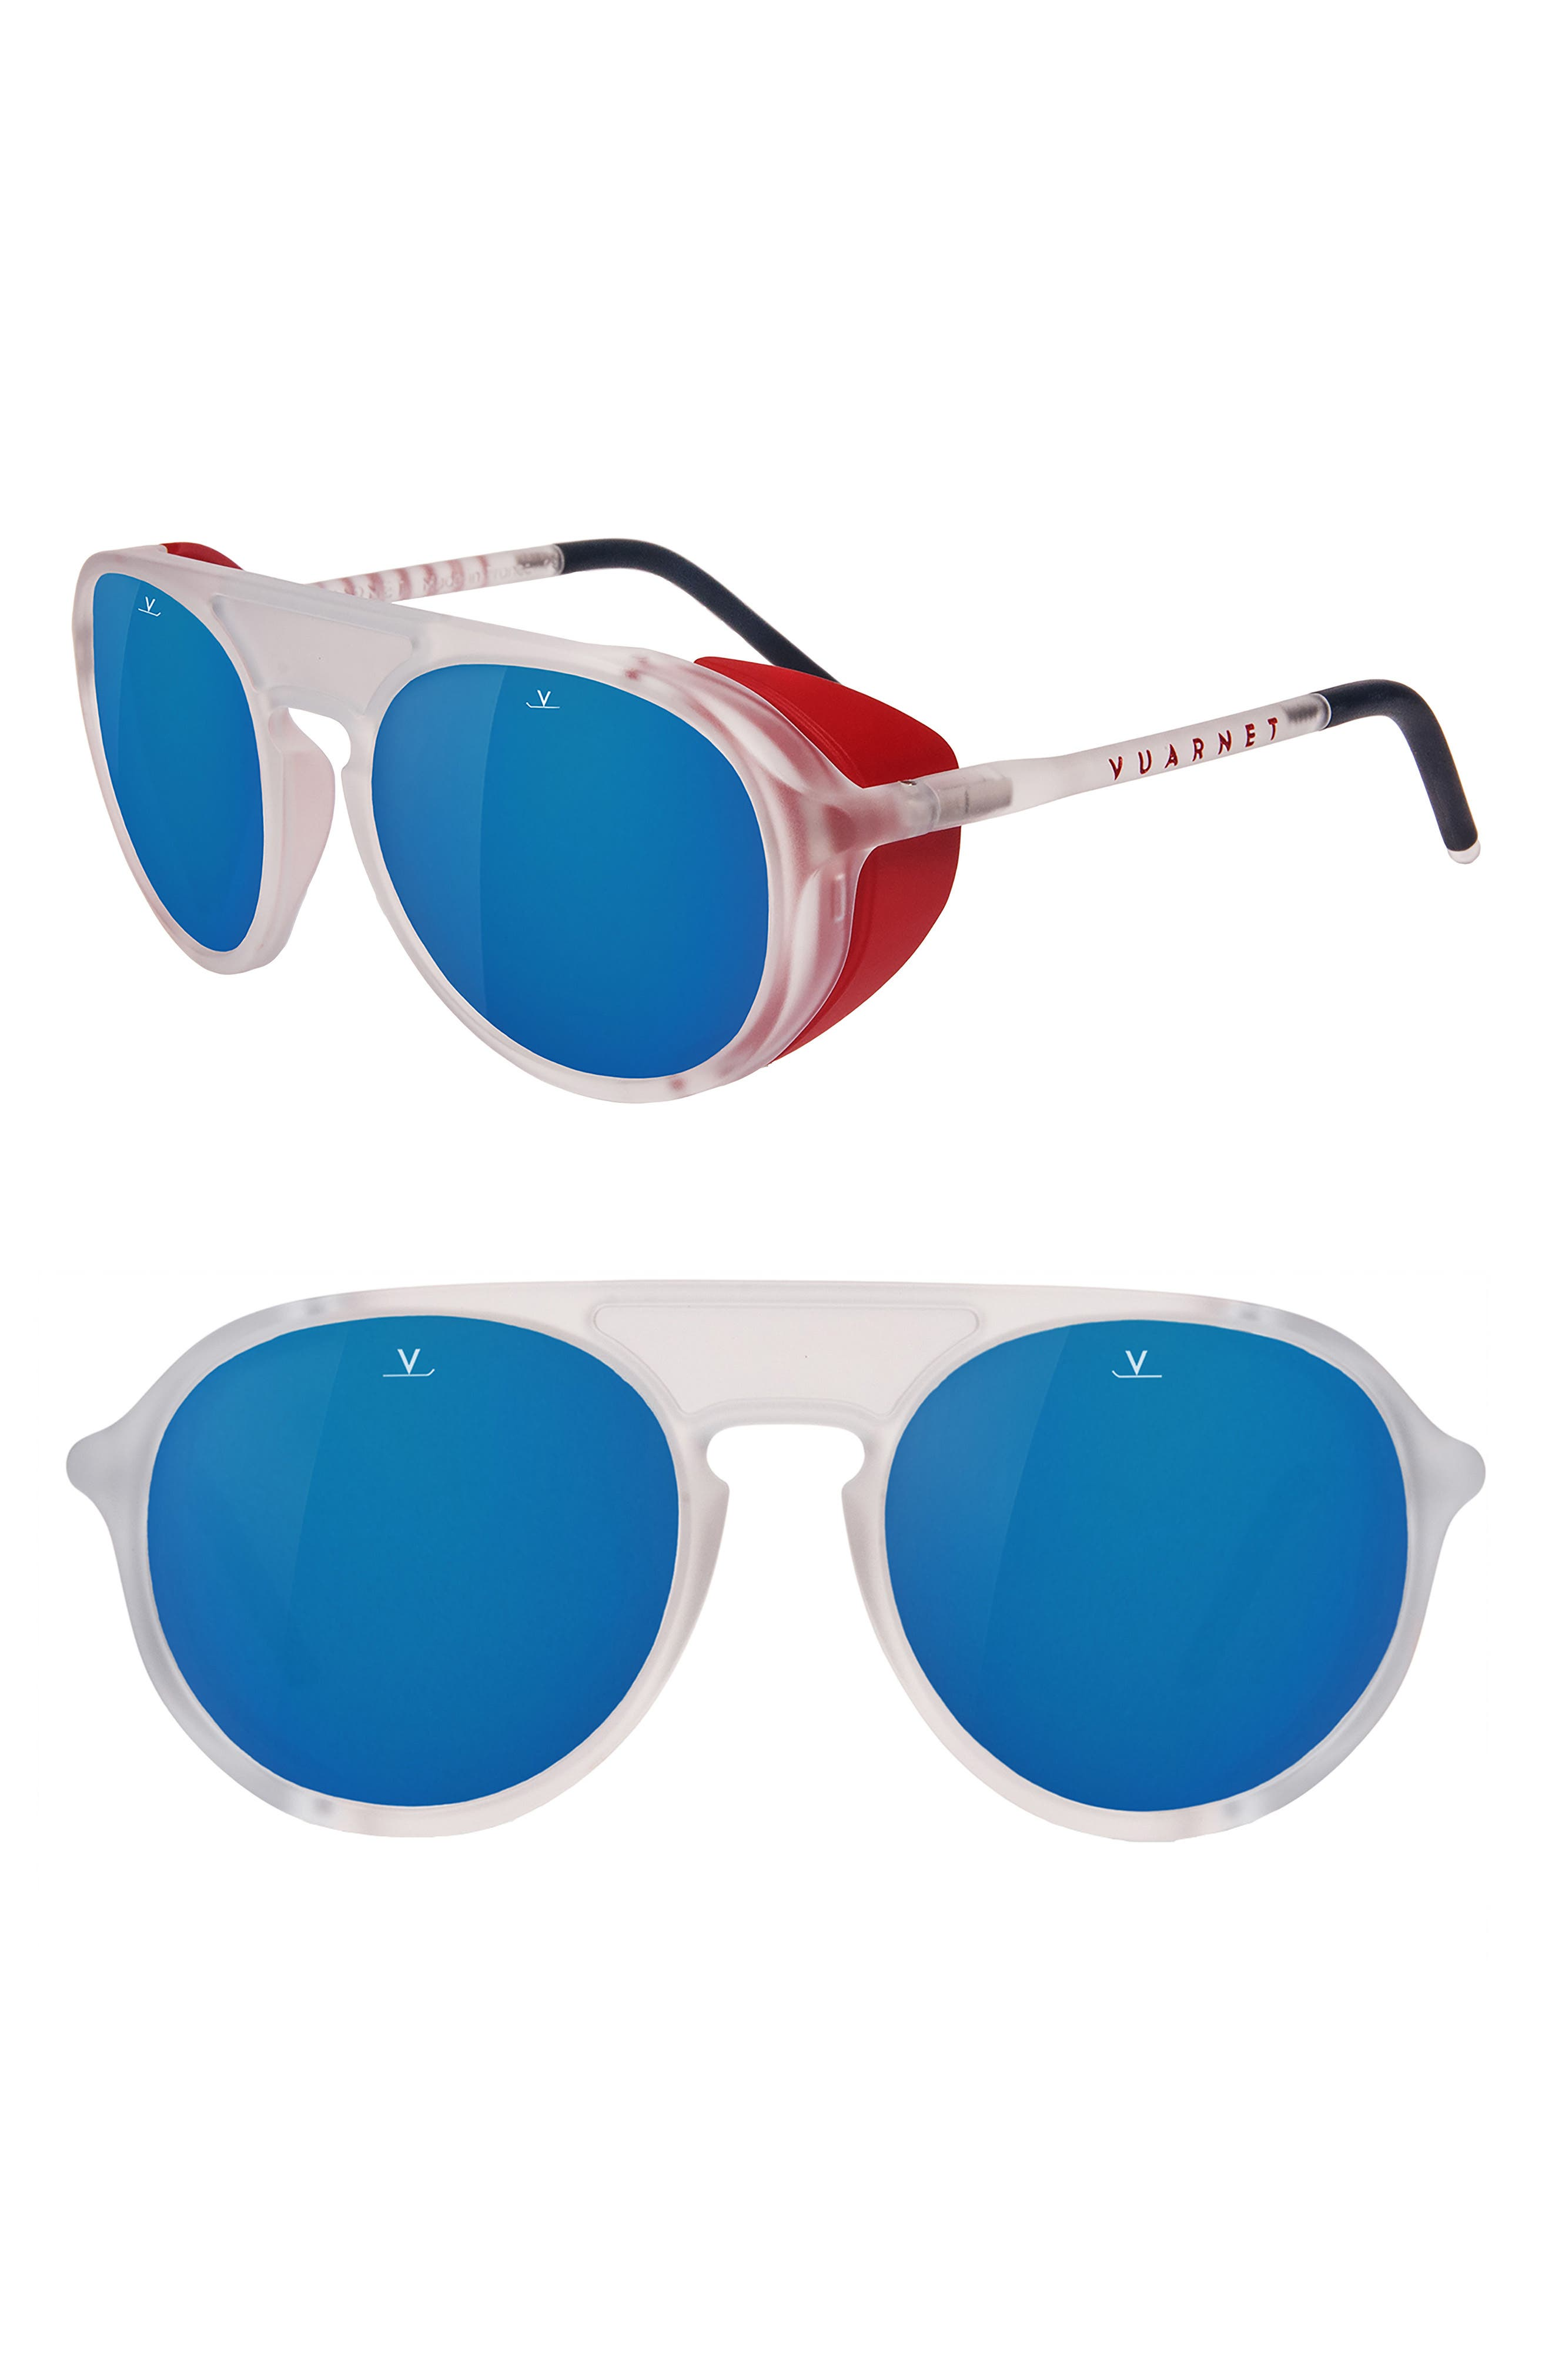 Alternate Image 1 Selected - Vuarnet Ice 51mm Polarized Aviator Sunglasses